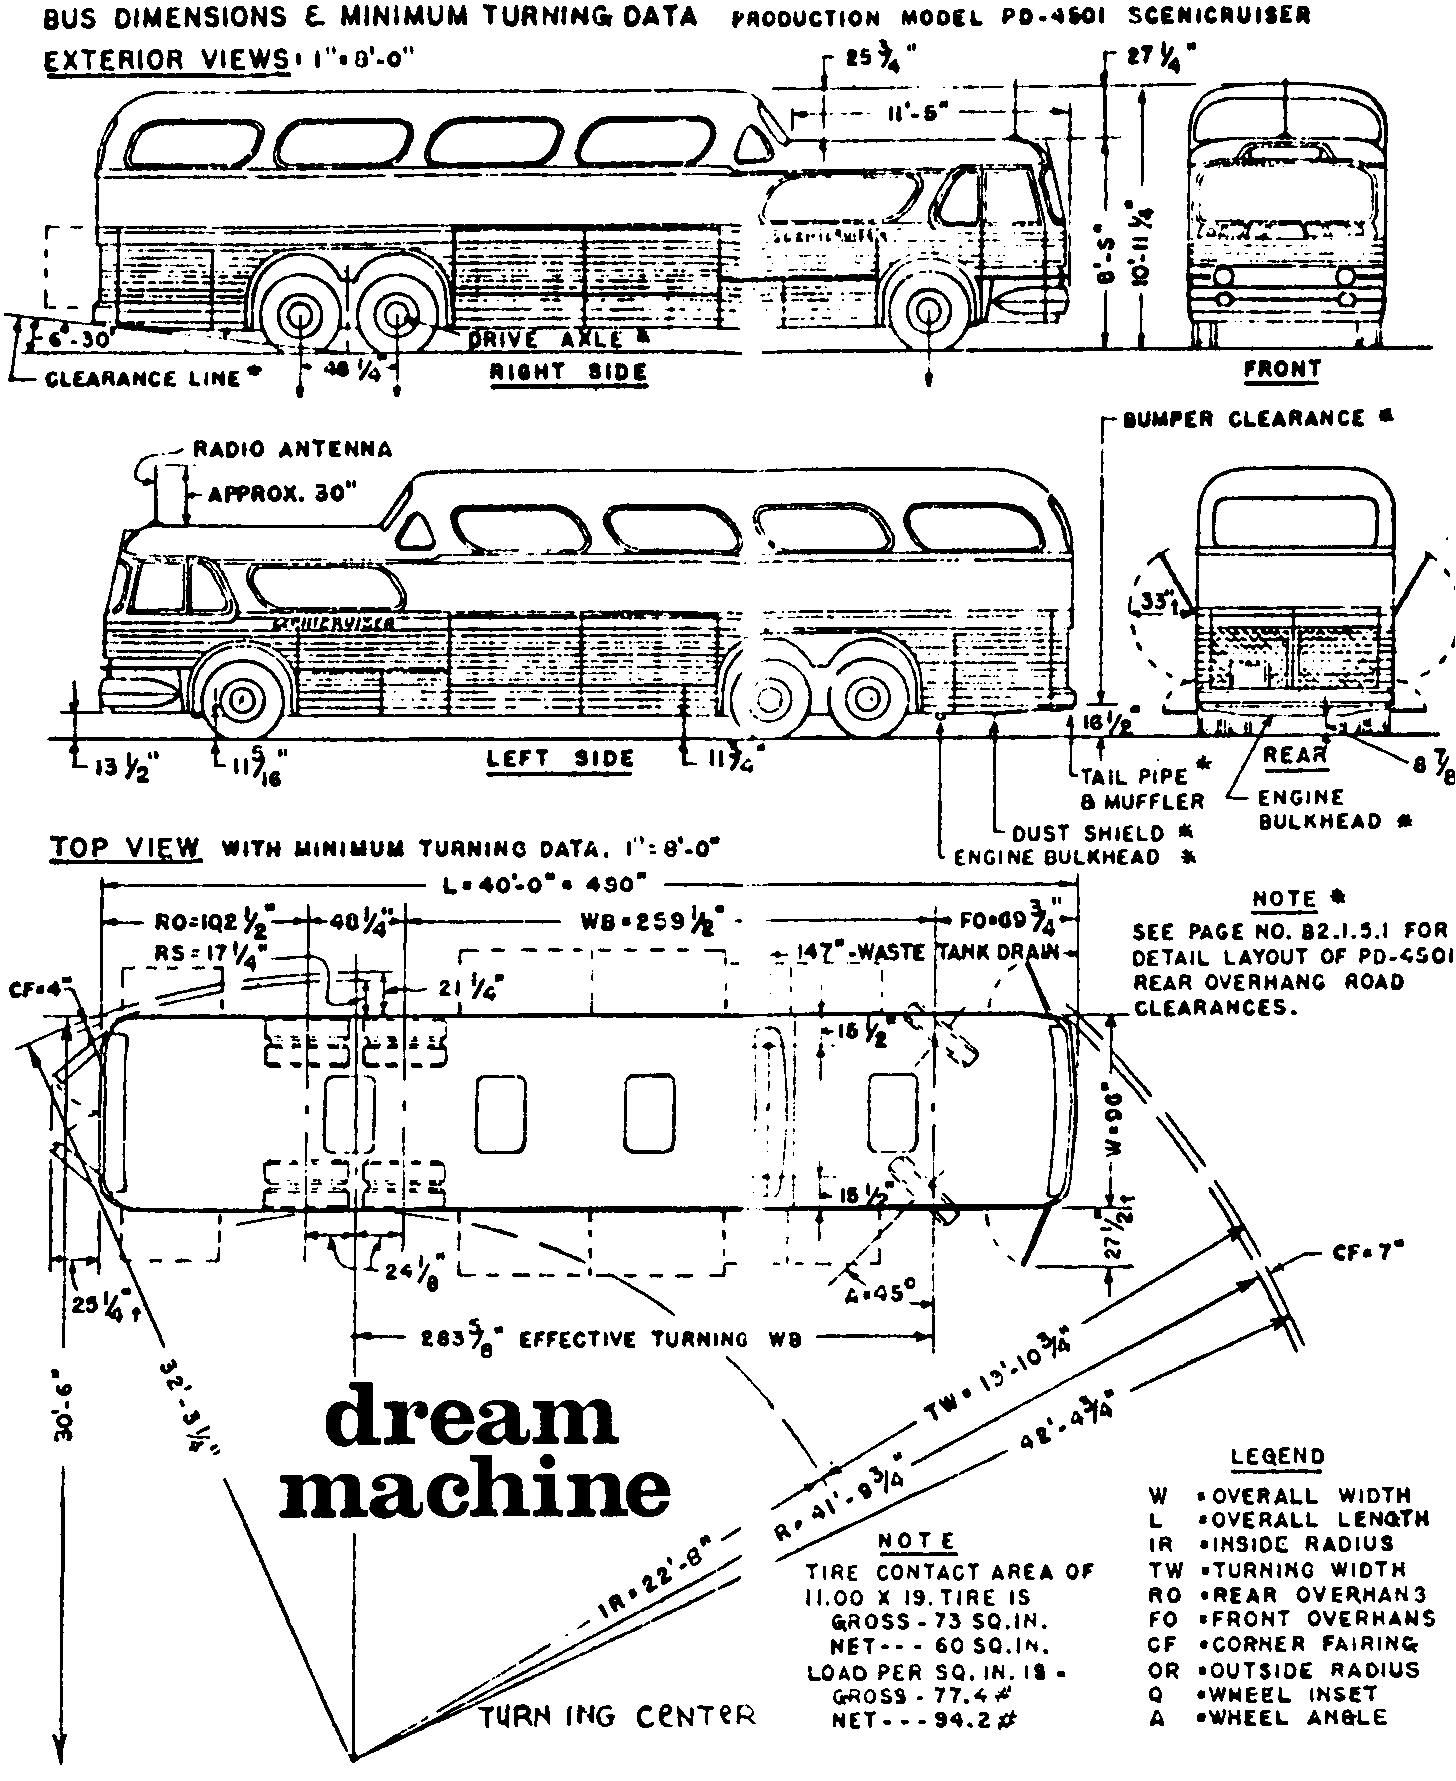 gm bus engine diagram 72 vw bus engine diagram #9